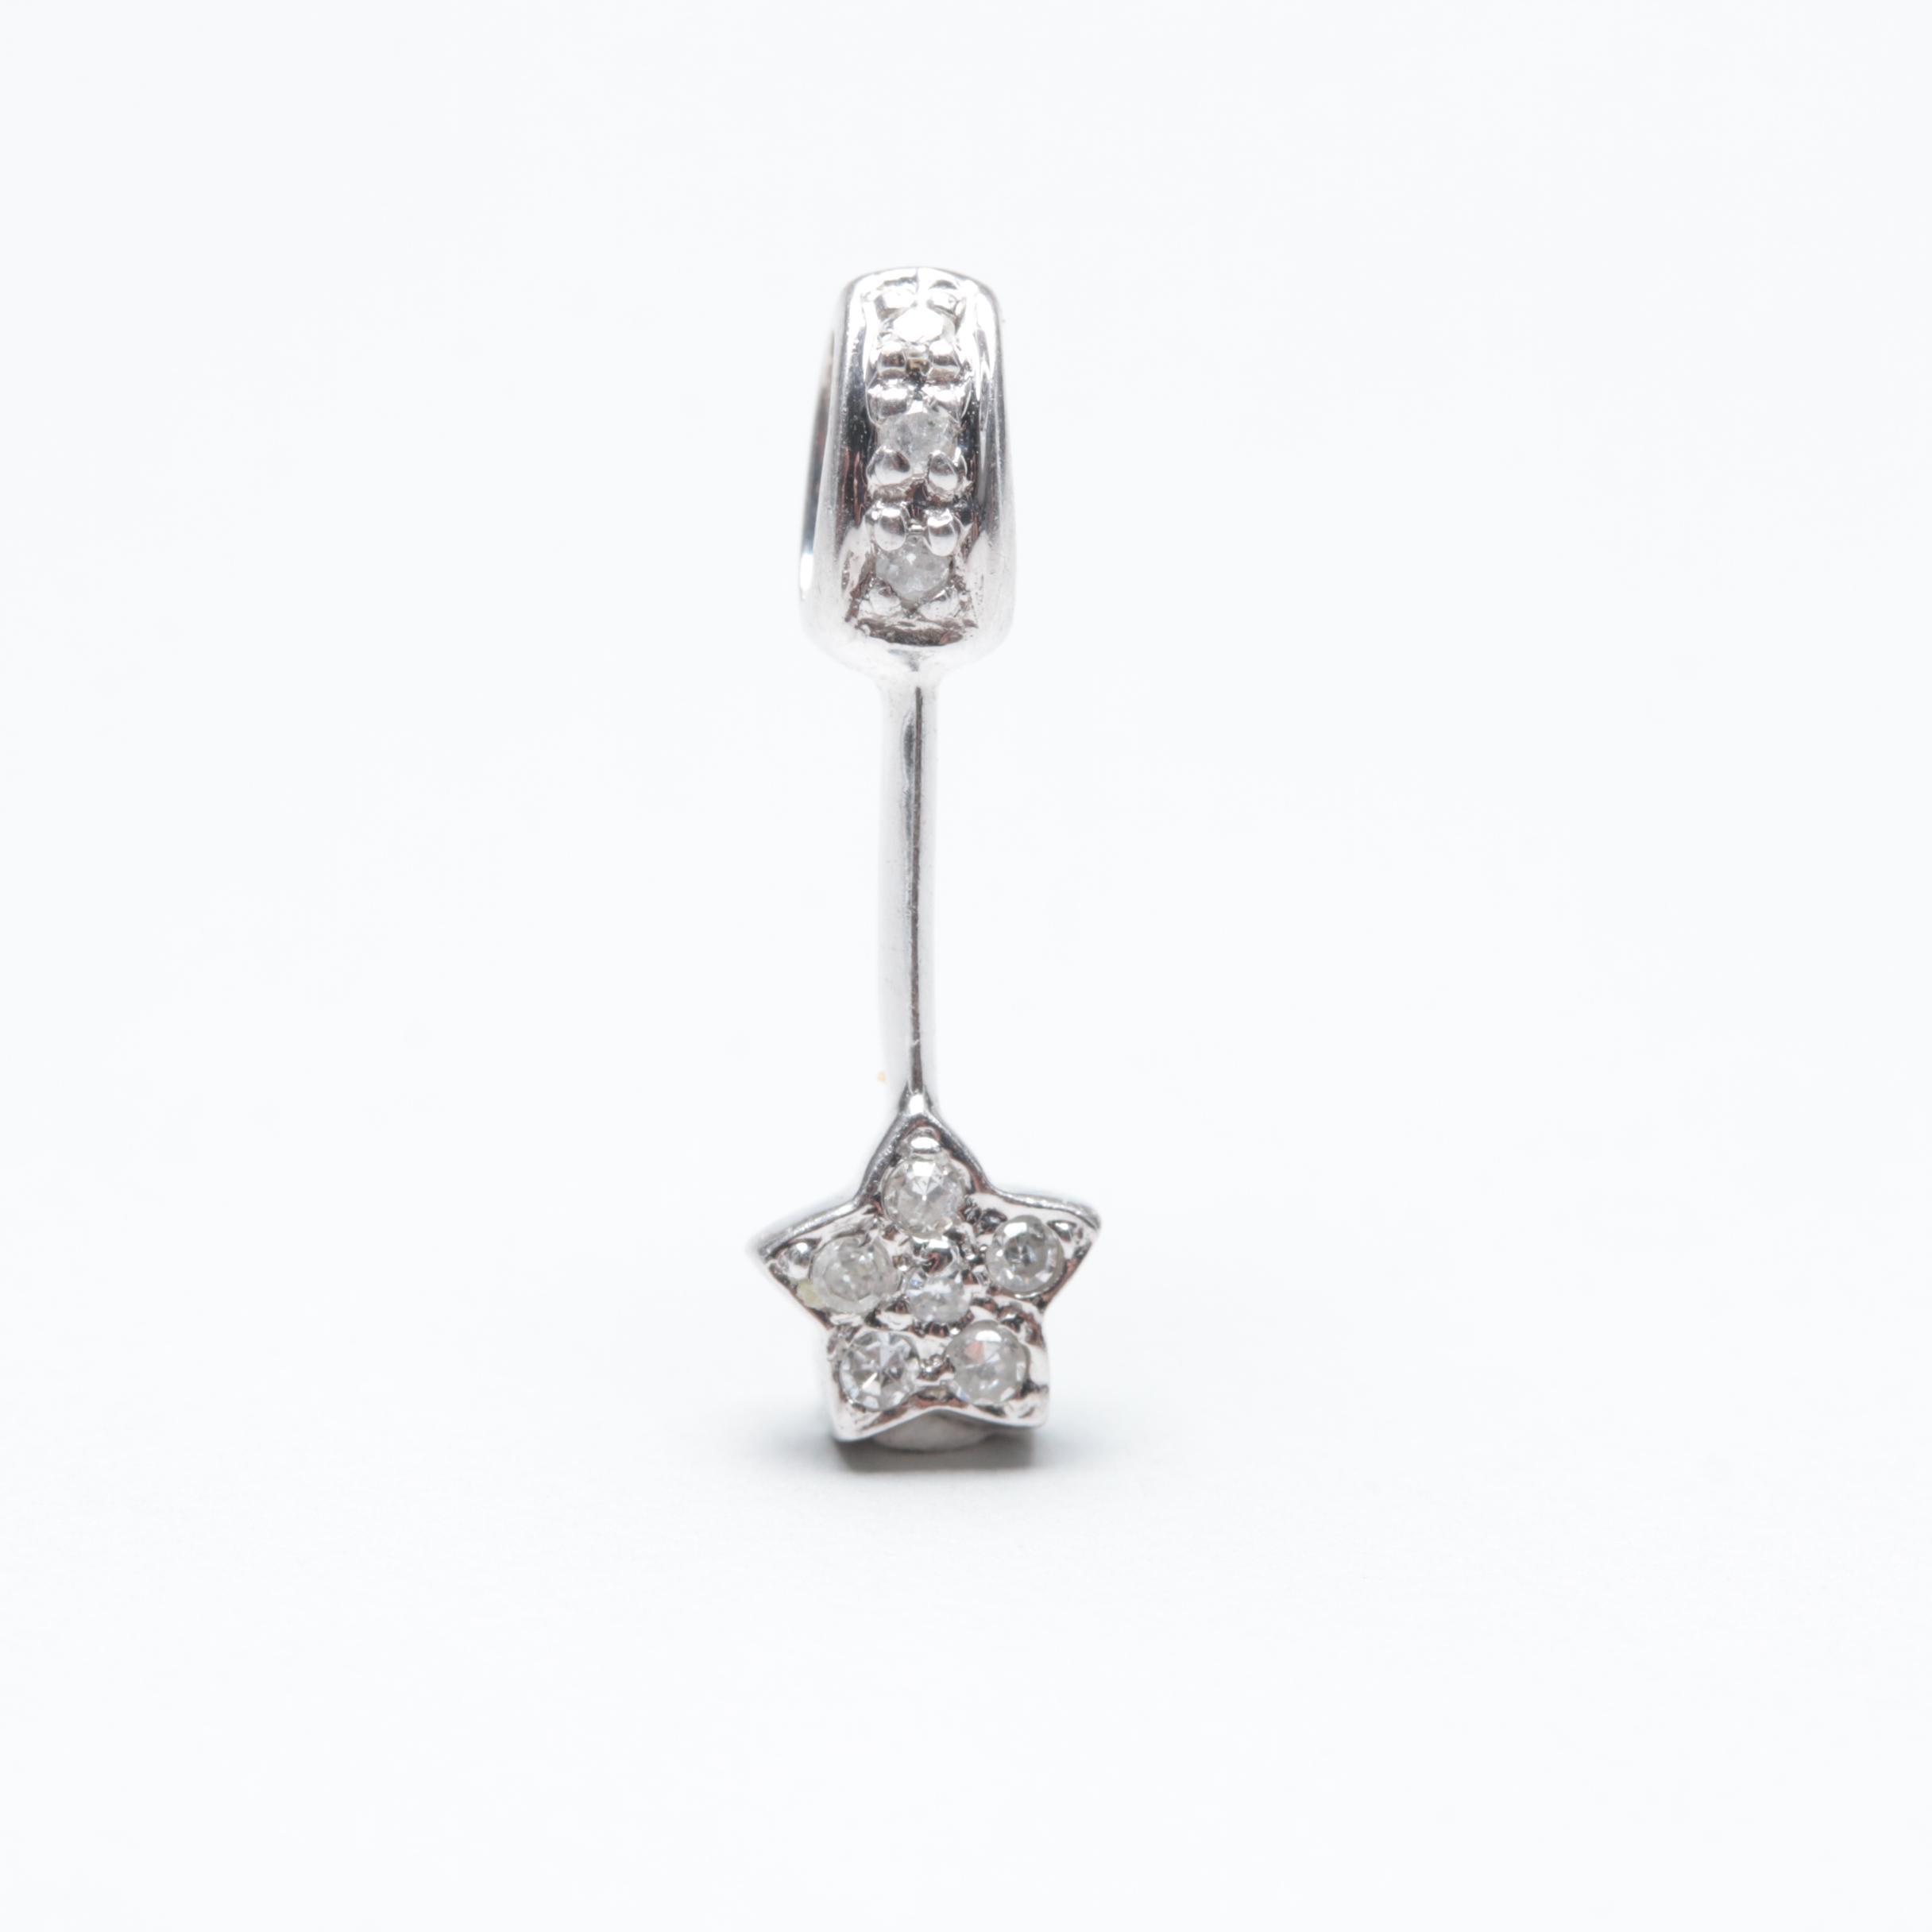 14K White Gold Diamond Star Pendant